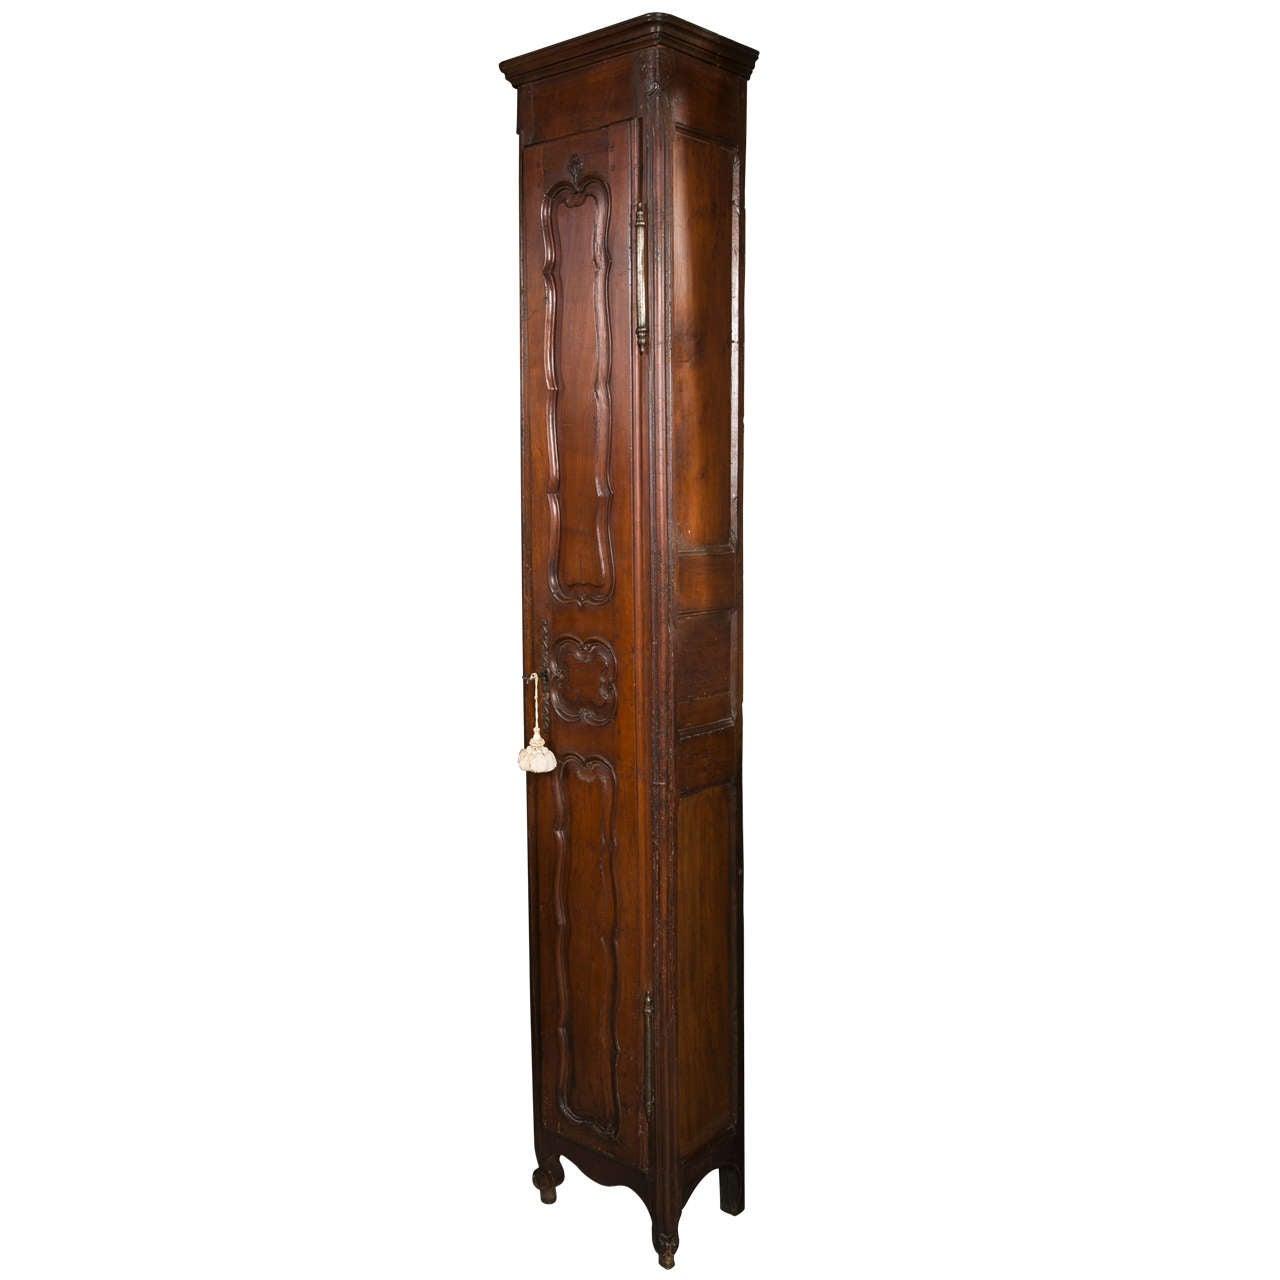 19th C Antique French Walnut Chimney Cupboard At 1stdibs